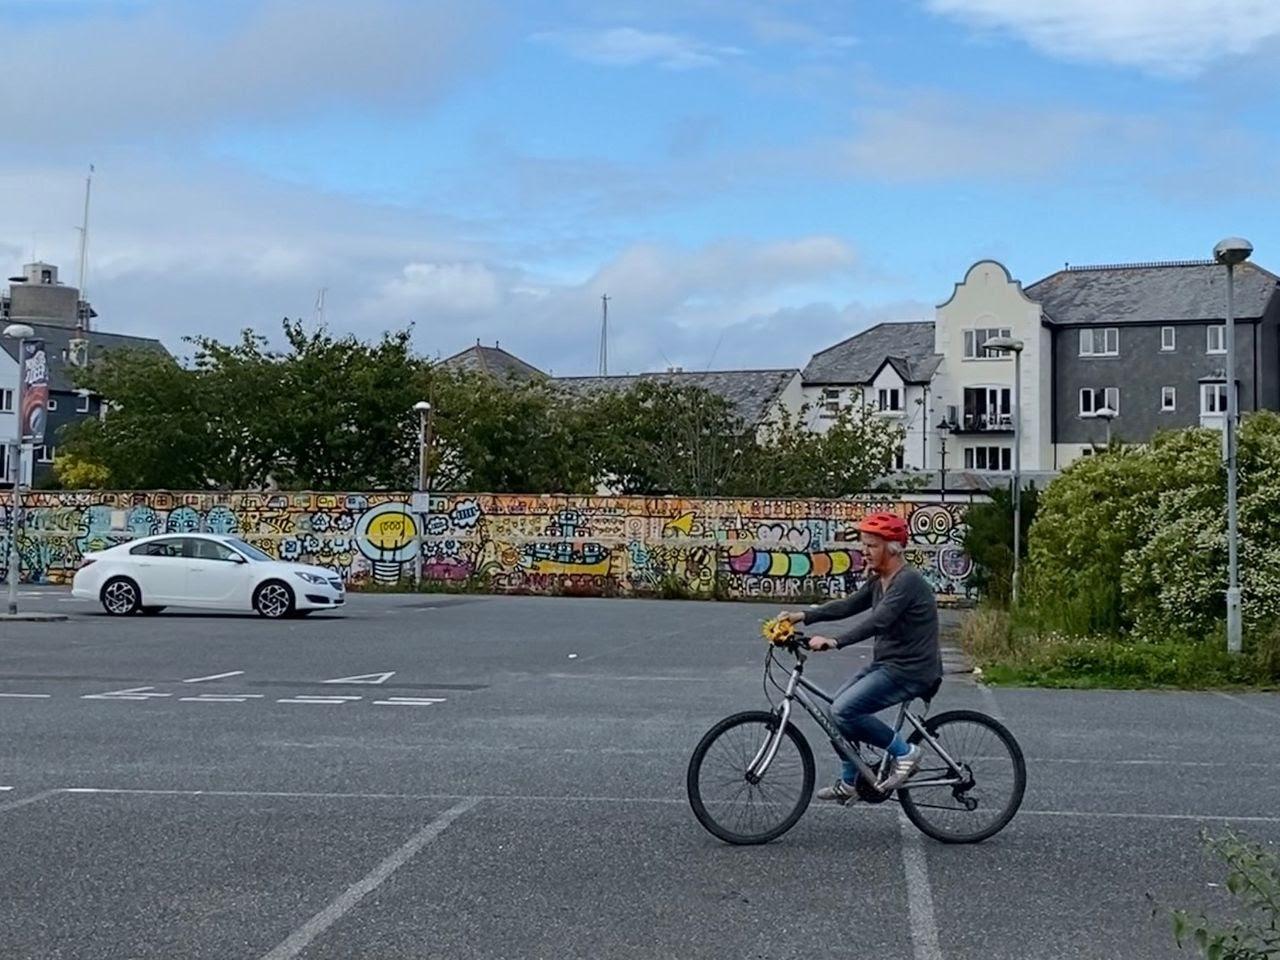 A man riding a bike in a parking lot.